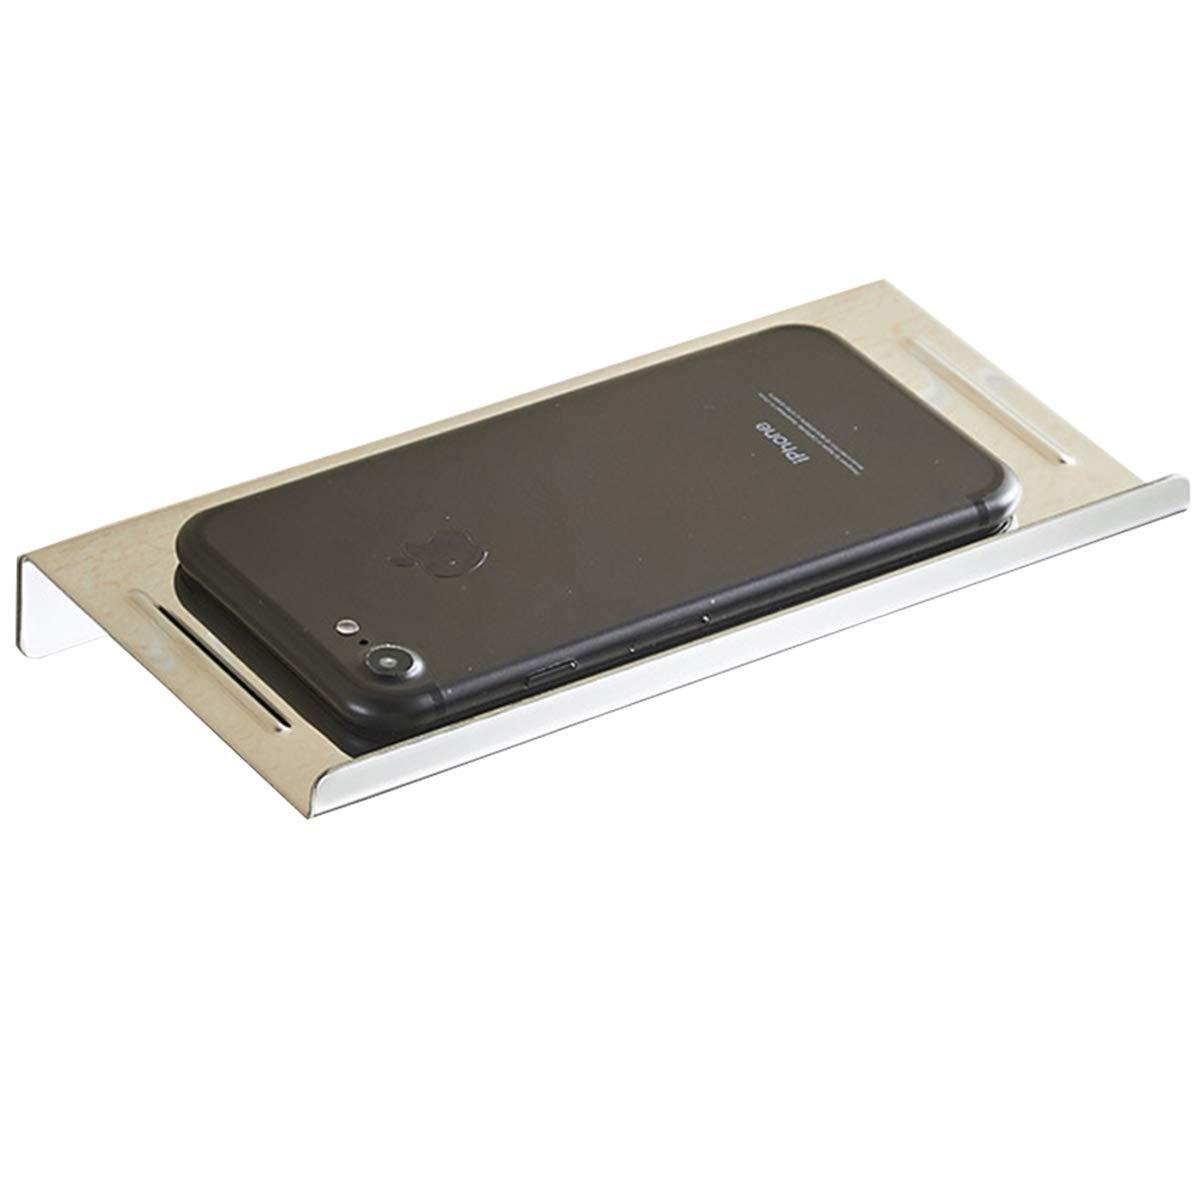 Flybath Bathroom Toilet Paper Phone Holder Shelf Carbon Steel Wall Mounted Matte Black Finish